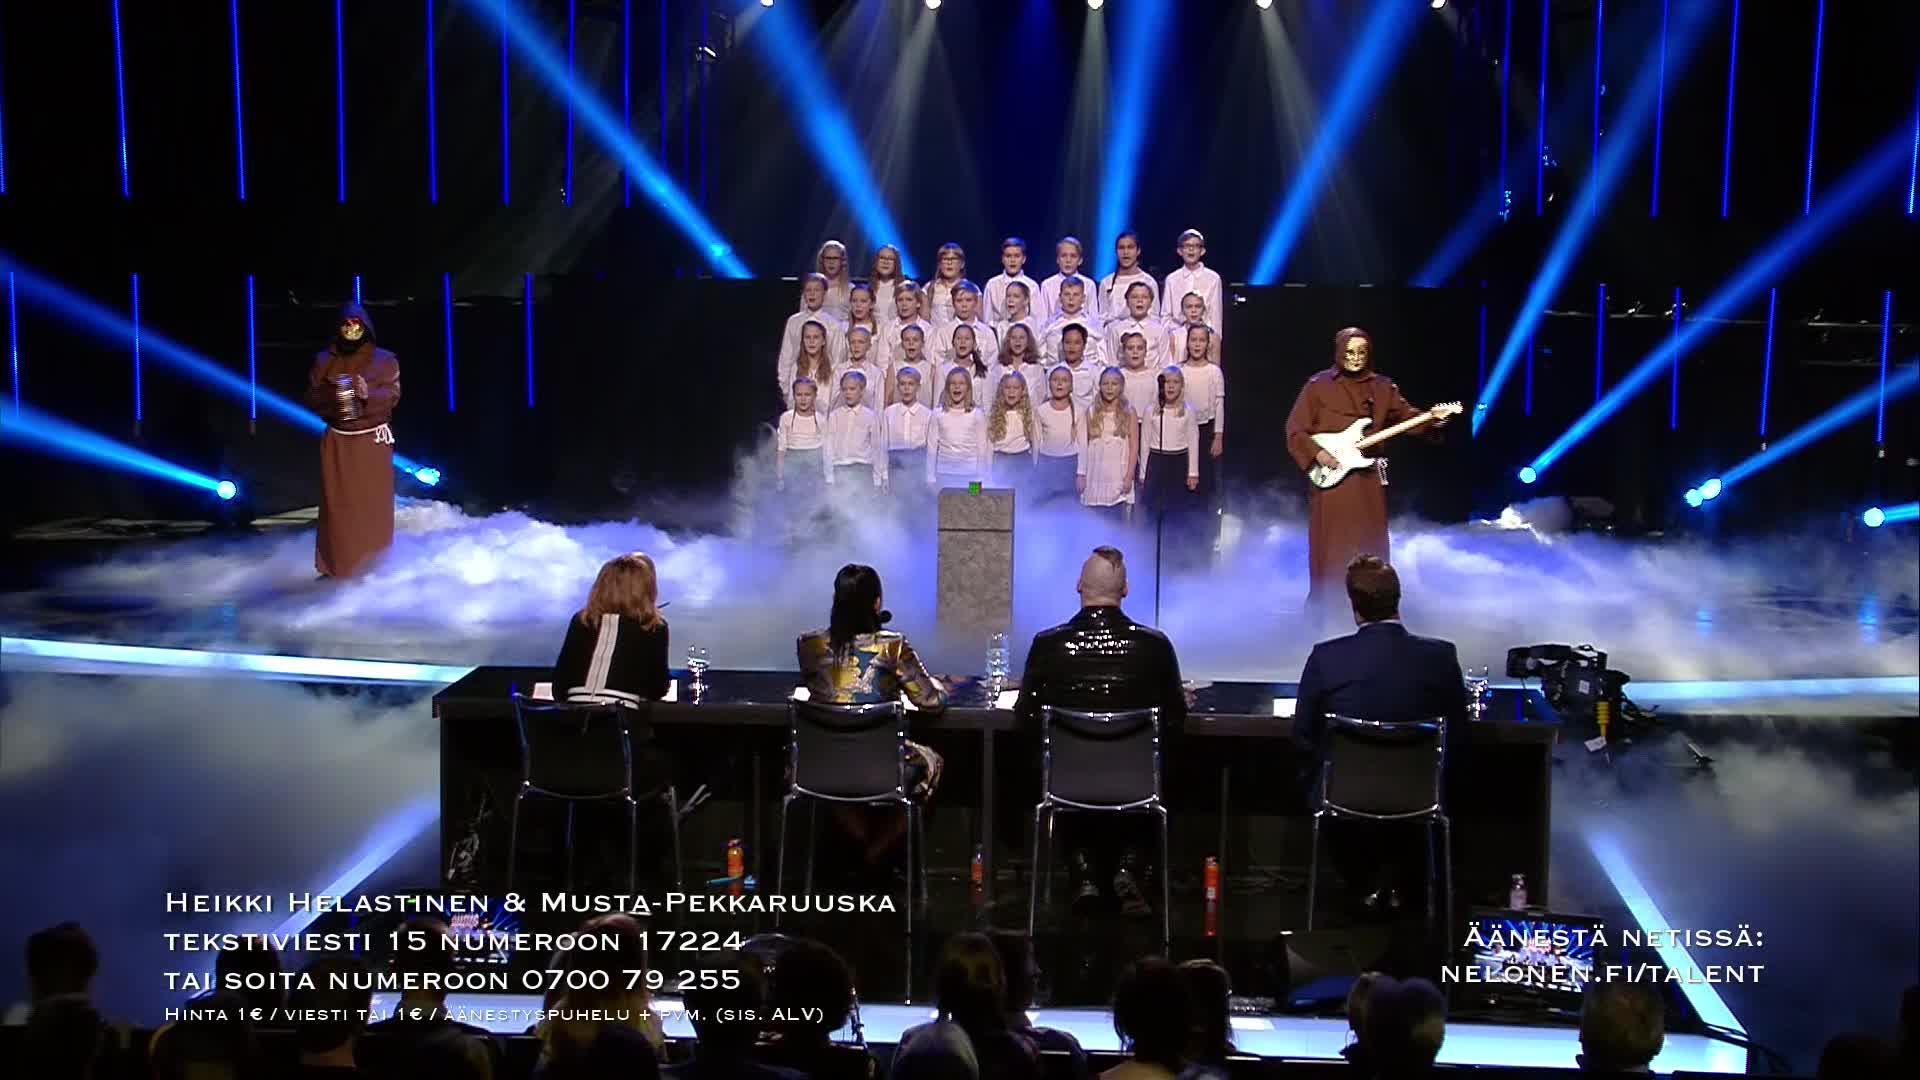 Heikki Helastinen Talent